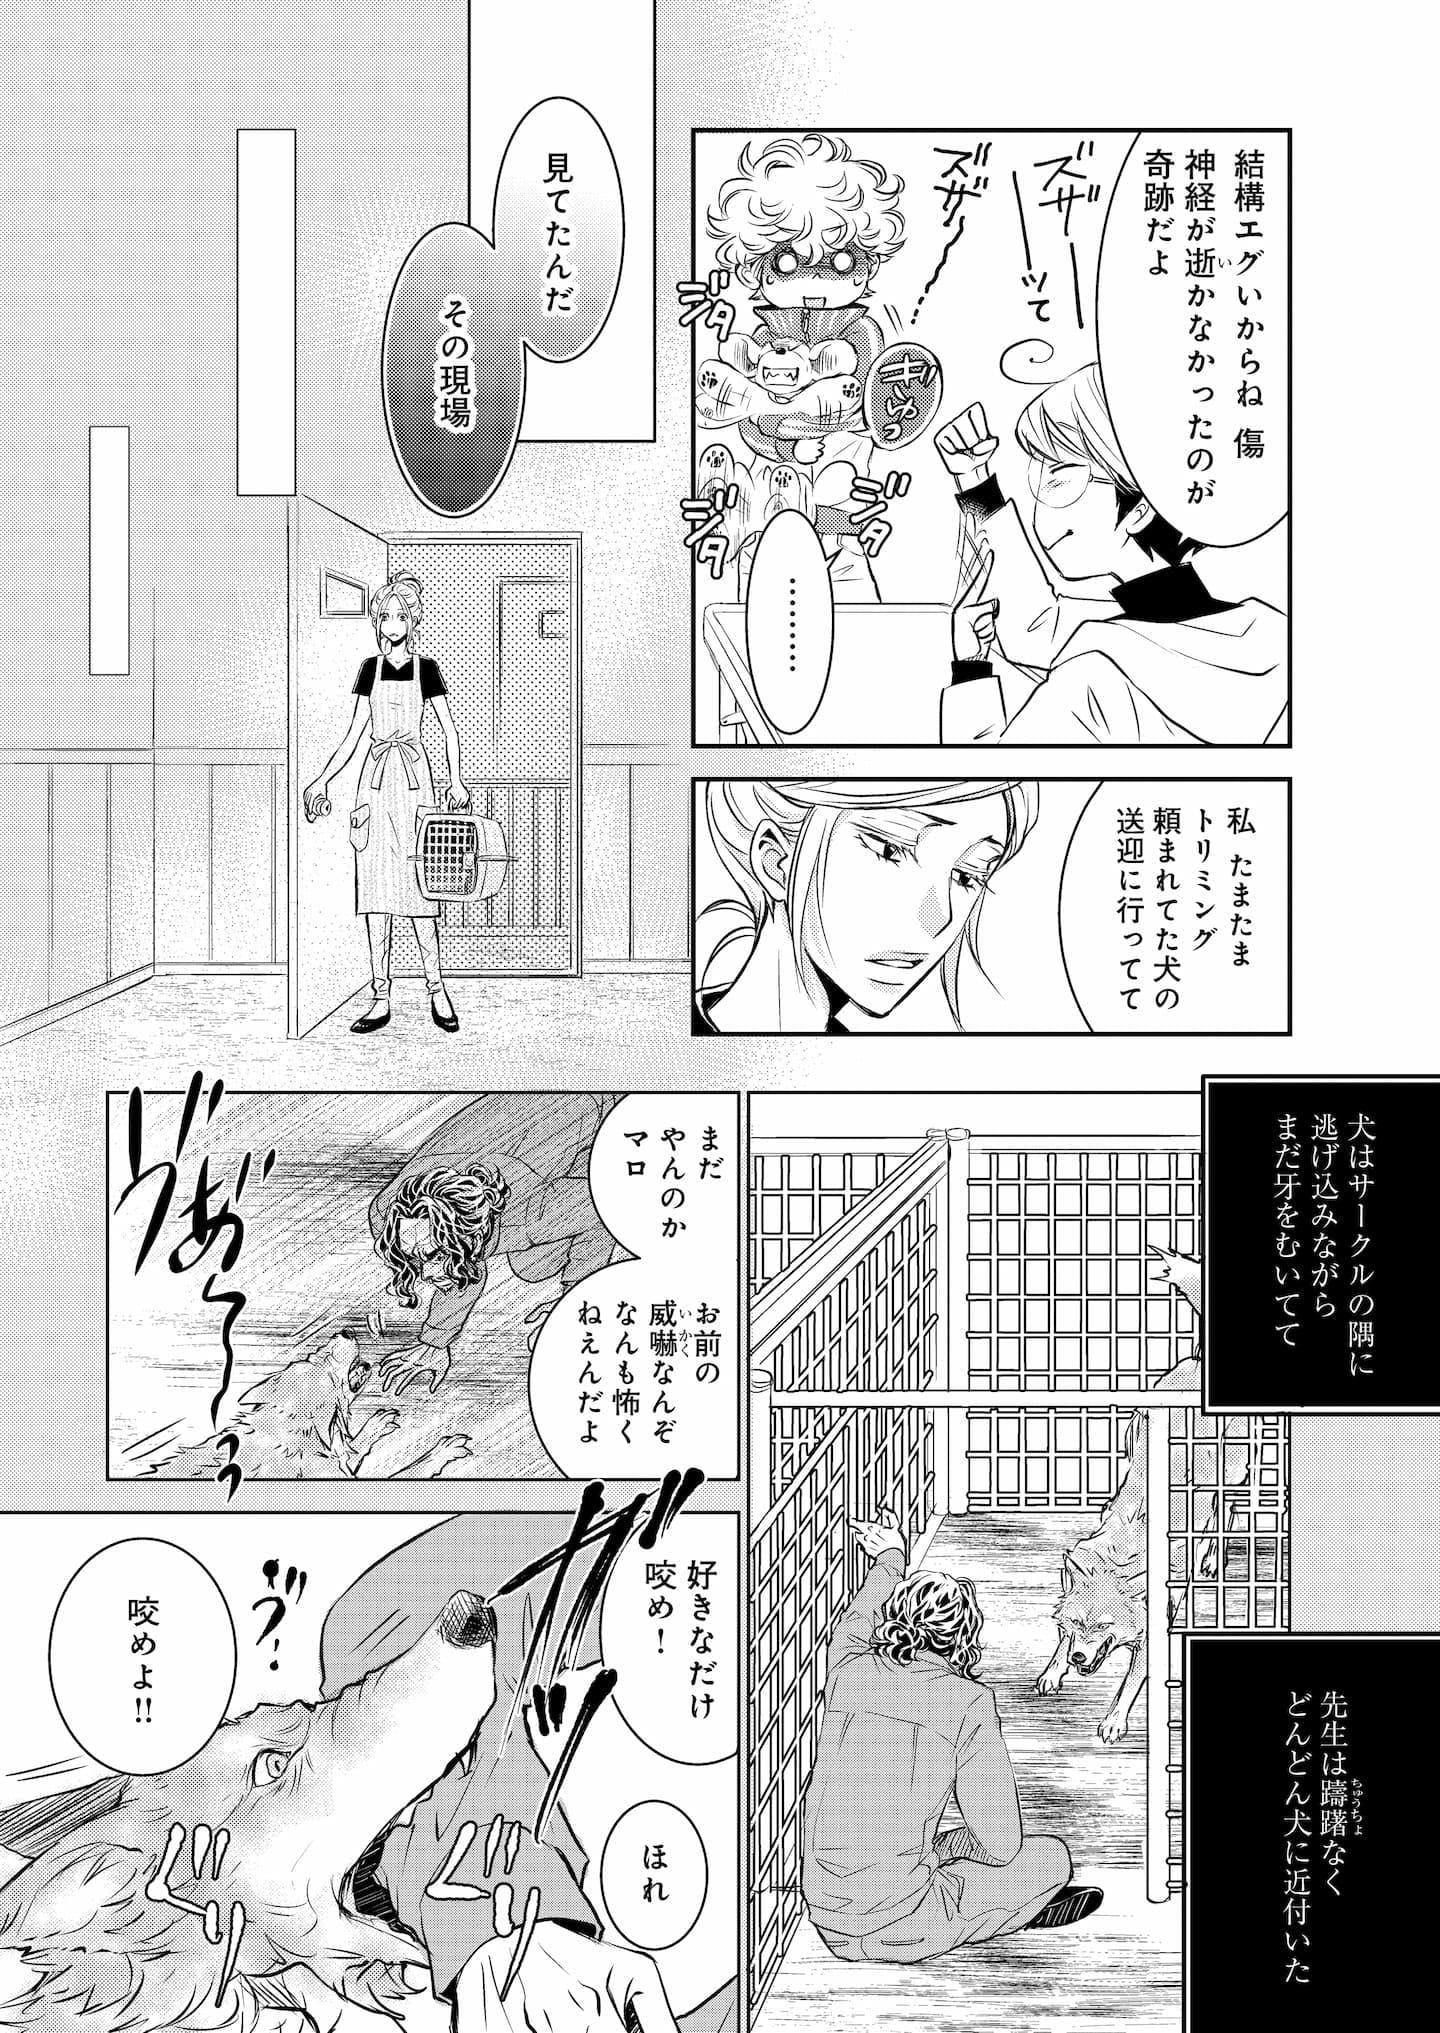 『DOG SIGNAL』9話目③ 2zzページ目